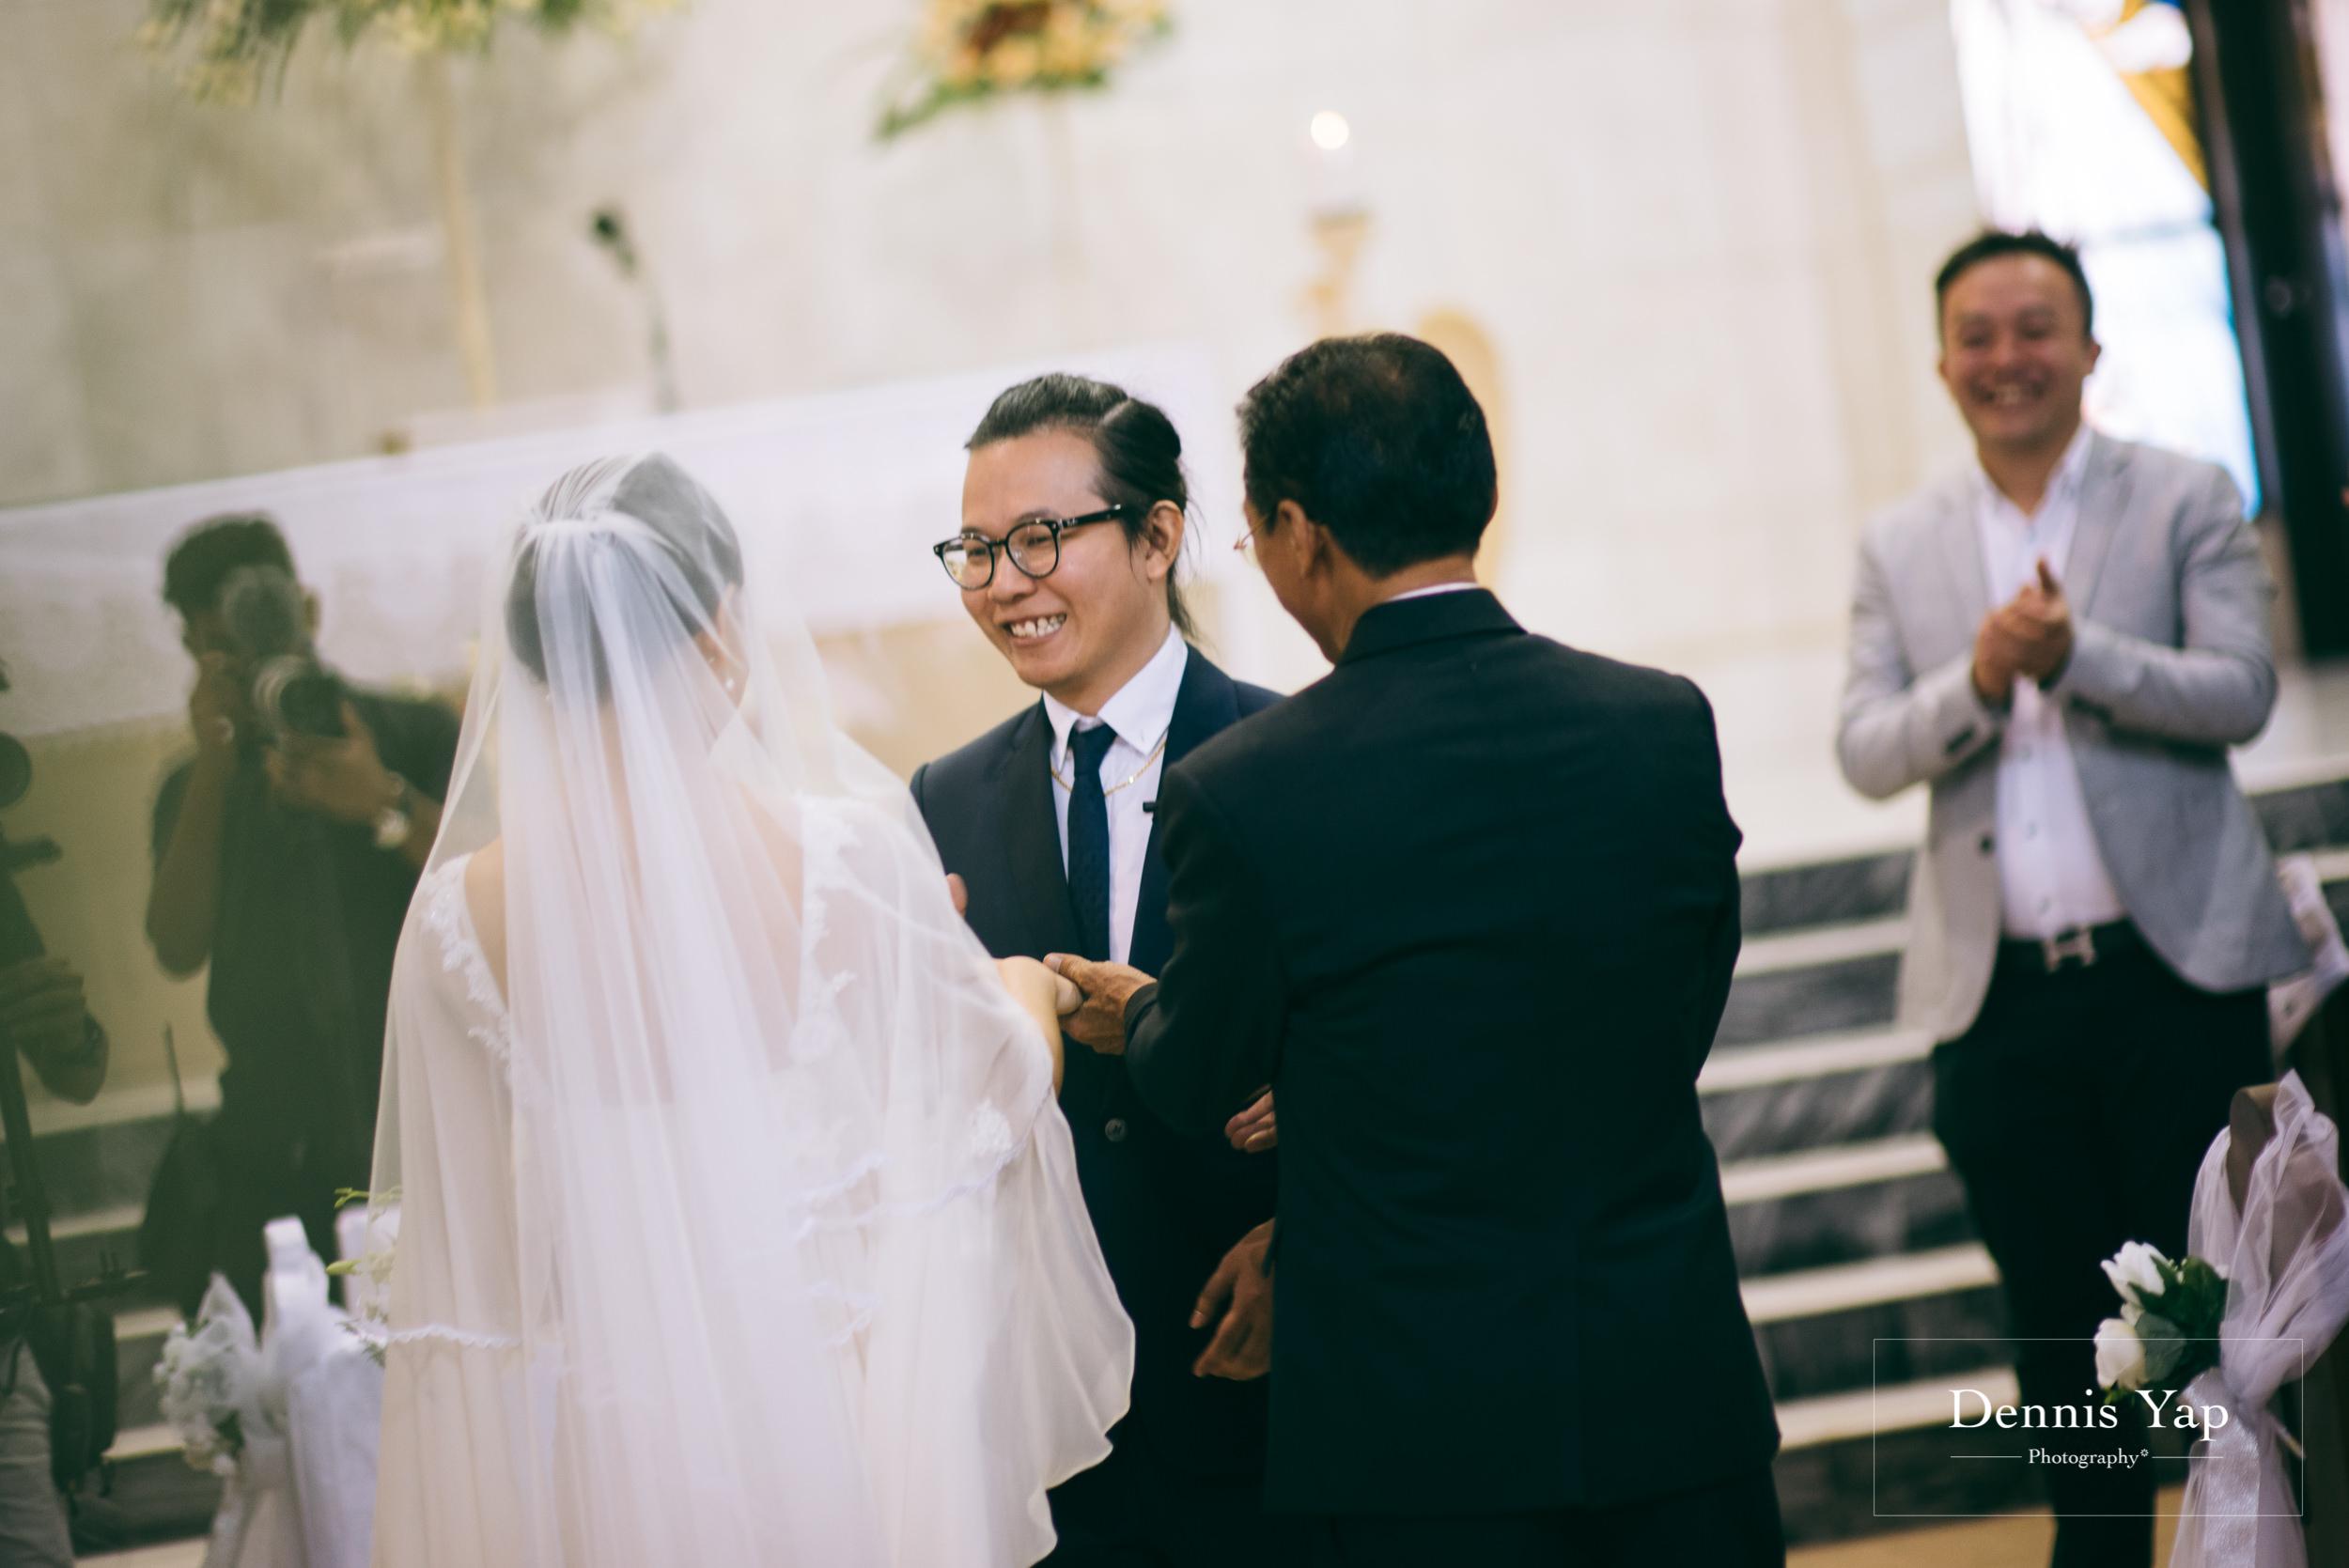 sandro kitty wedding day majestic hotel kuala lumpur dennis yap photography malaysia top wedding photographer-16.jpg